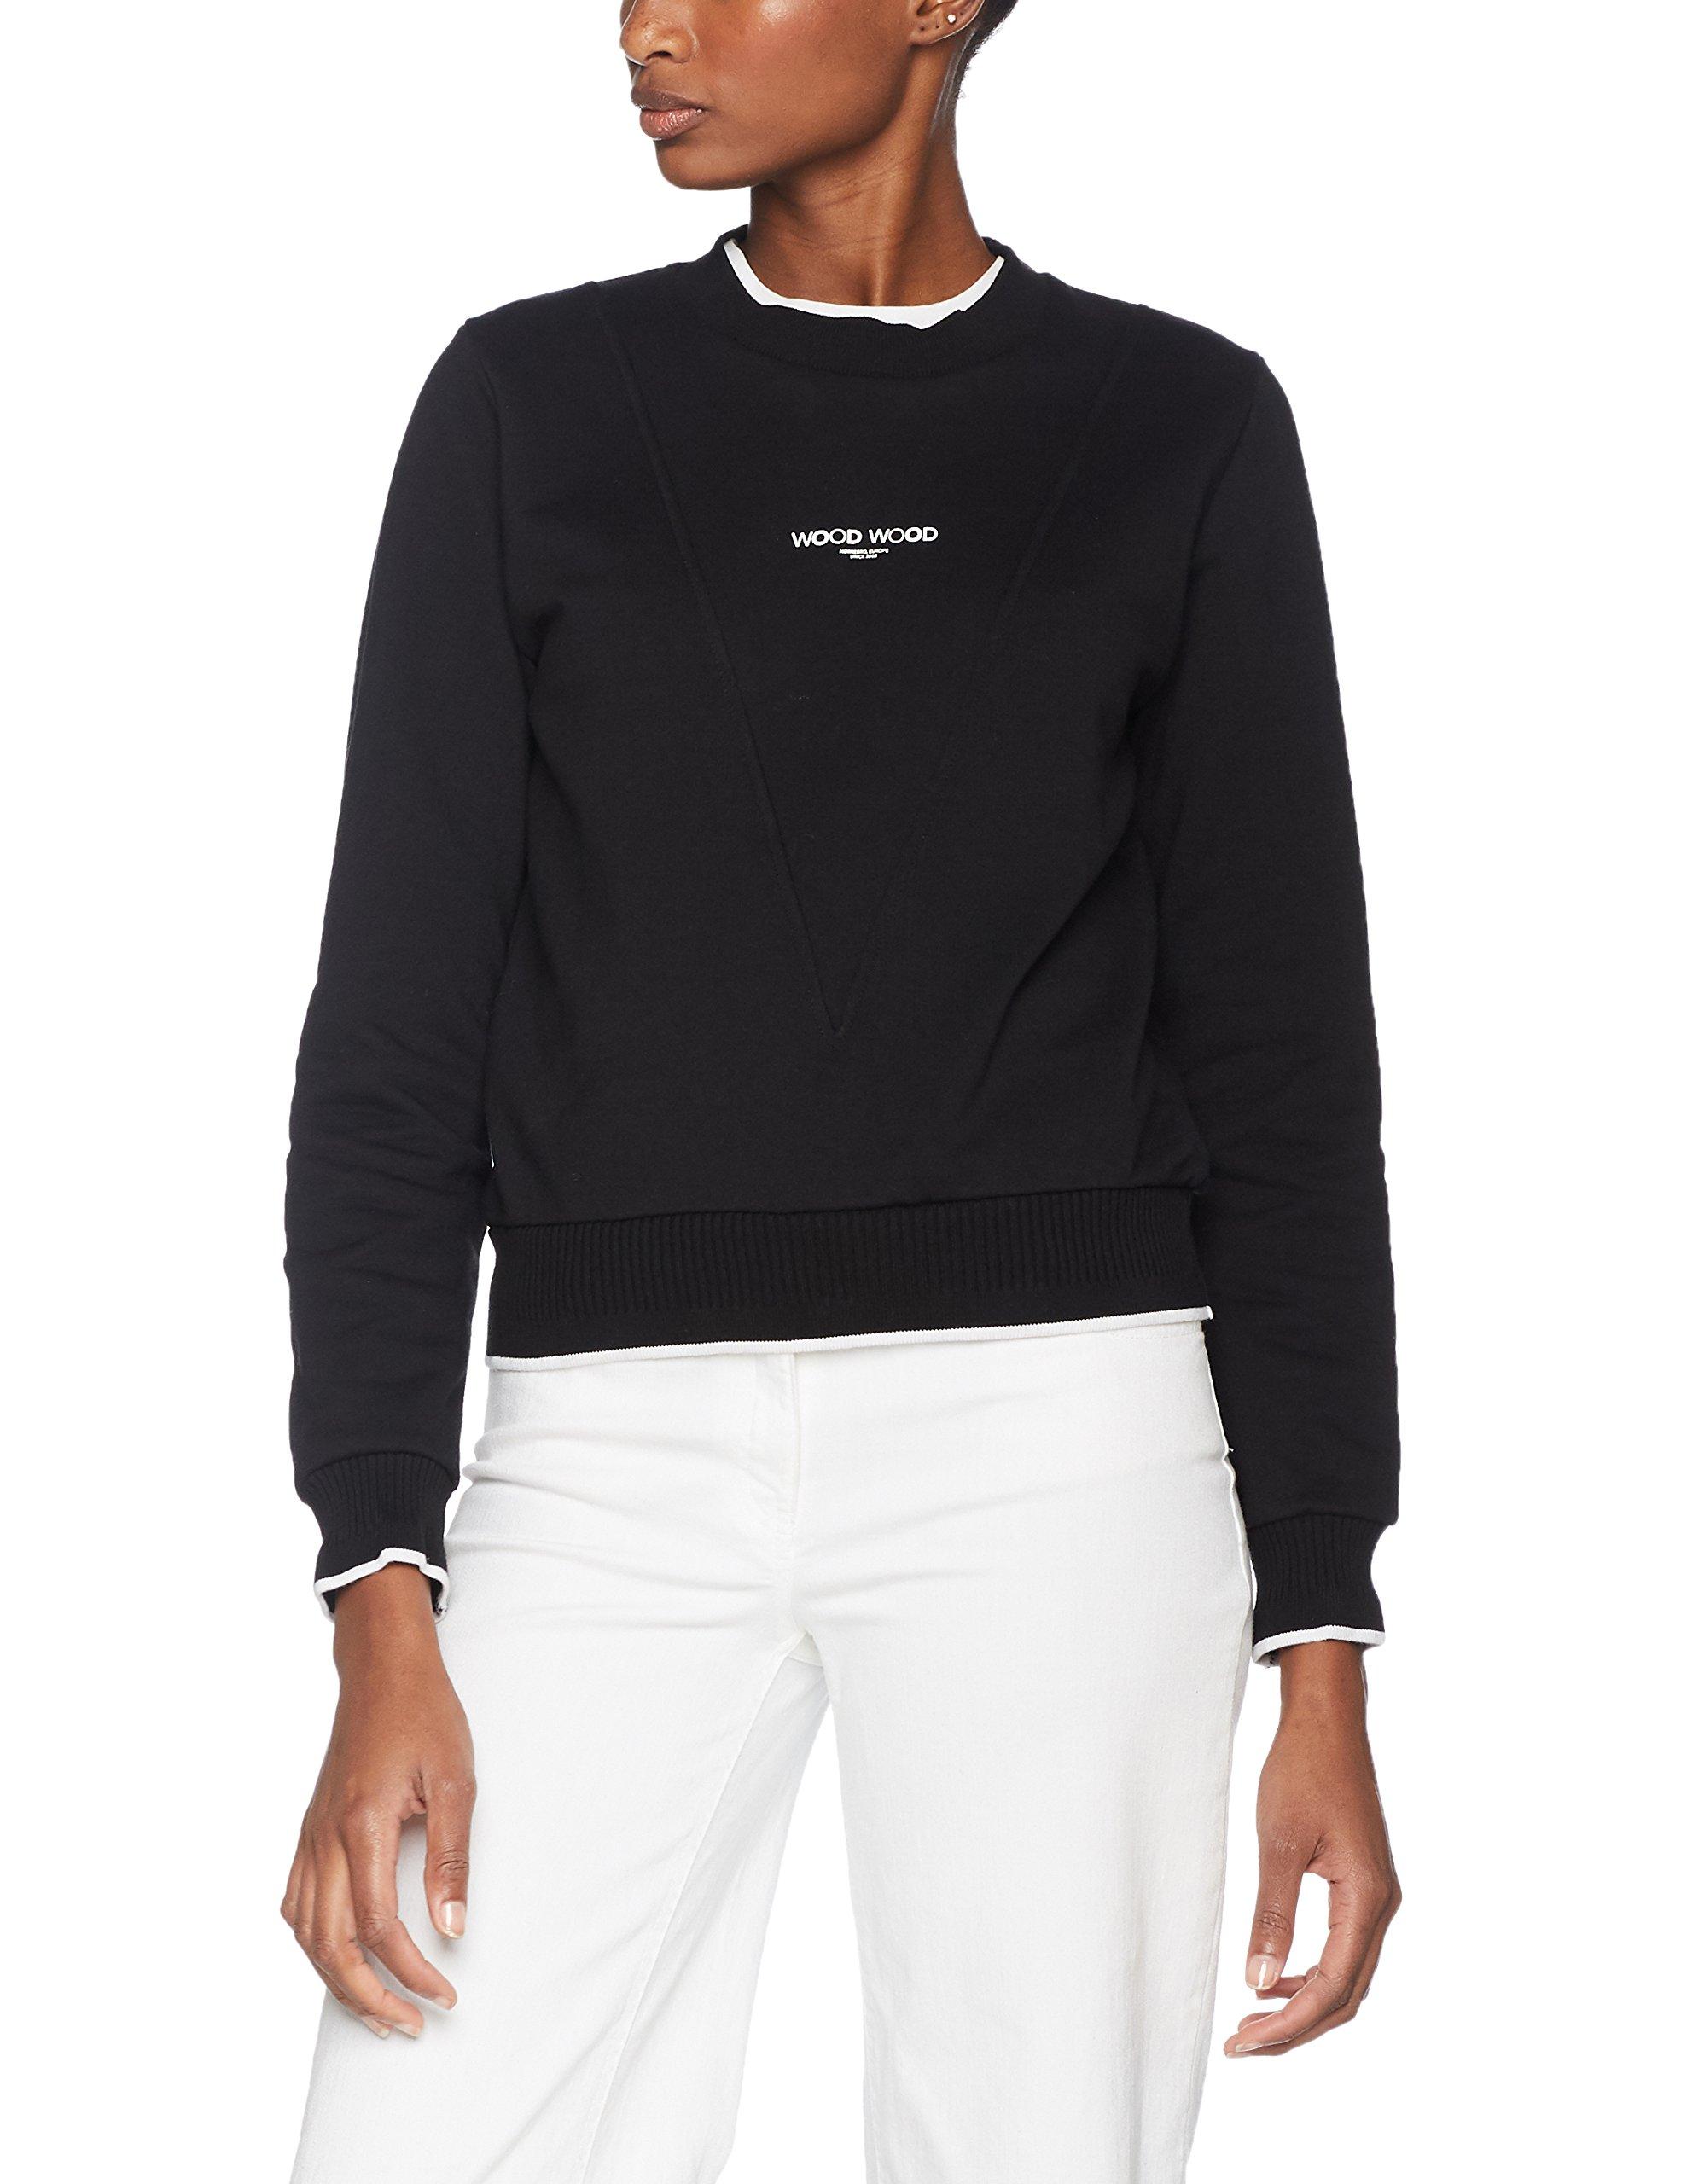 Sweatshirt Sweat Wood Mary shirtNoirblack8taille FabricantSmallFemme ann Y6fyb7g